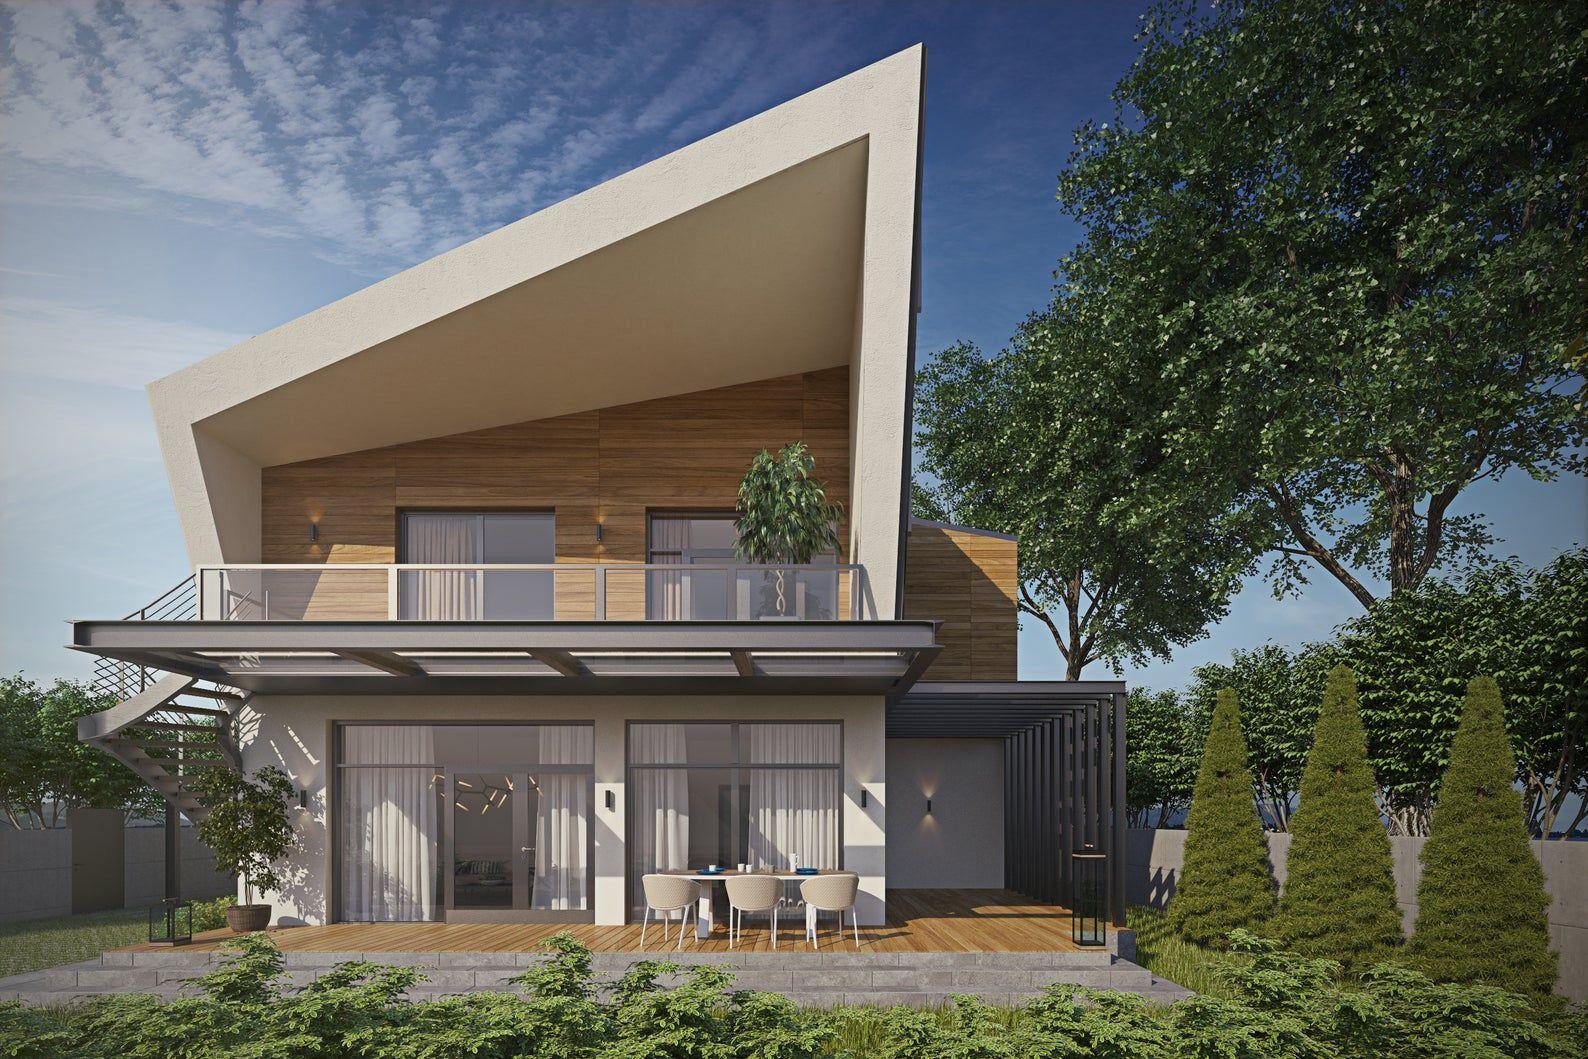 Modern House Plan Building Plans Blueprints & Material List 2018 193m 3